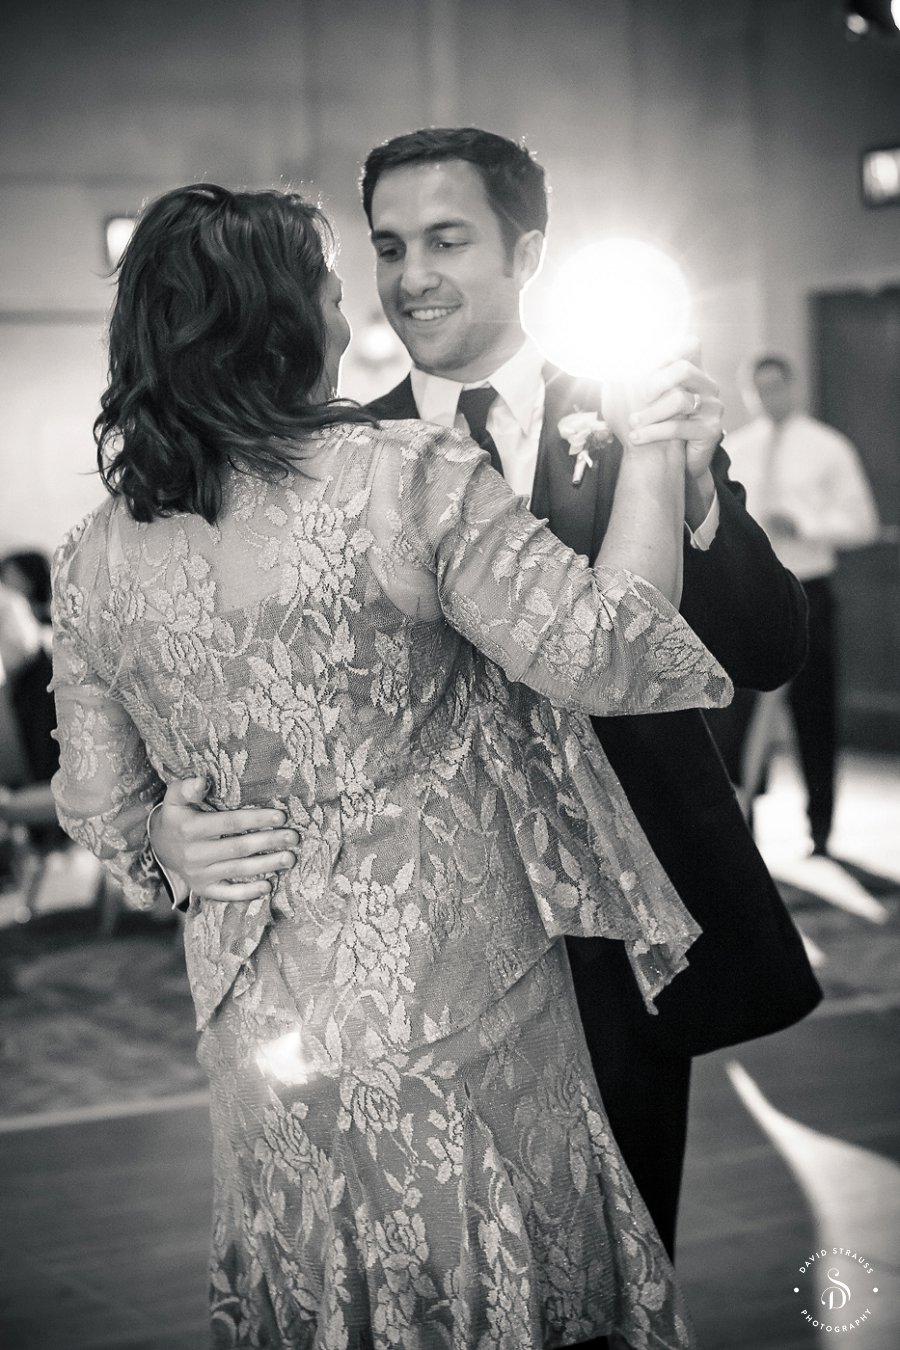 Atlanta Wedding Photography: Claire And Kyle -Charleston